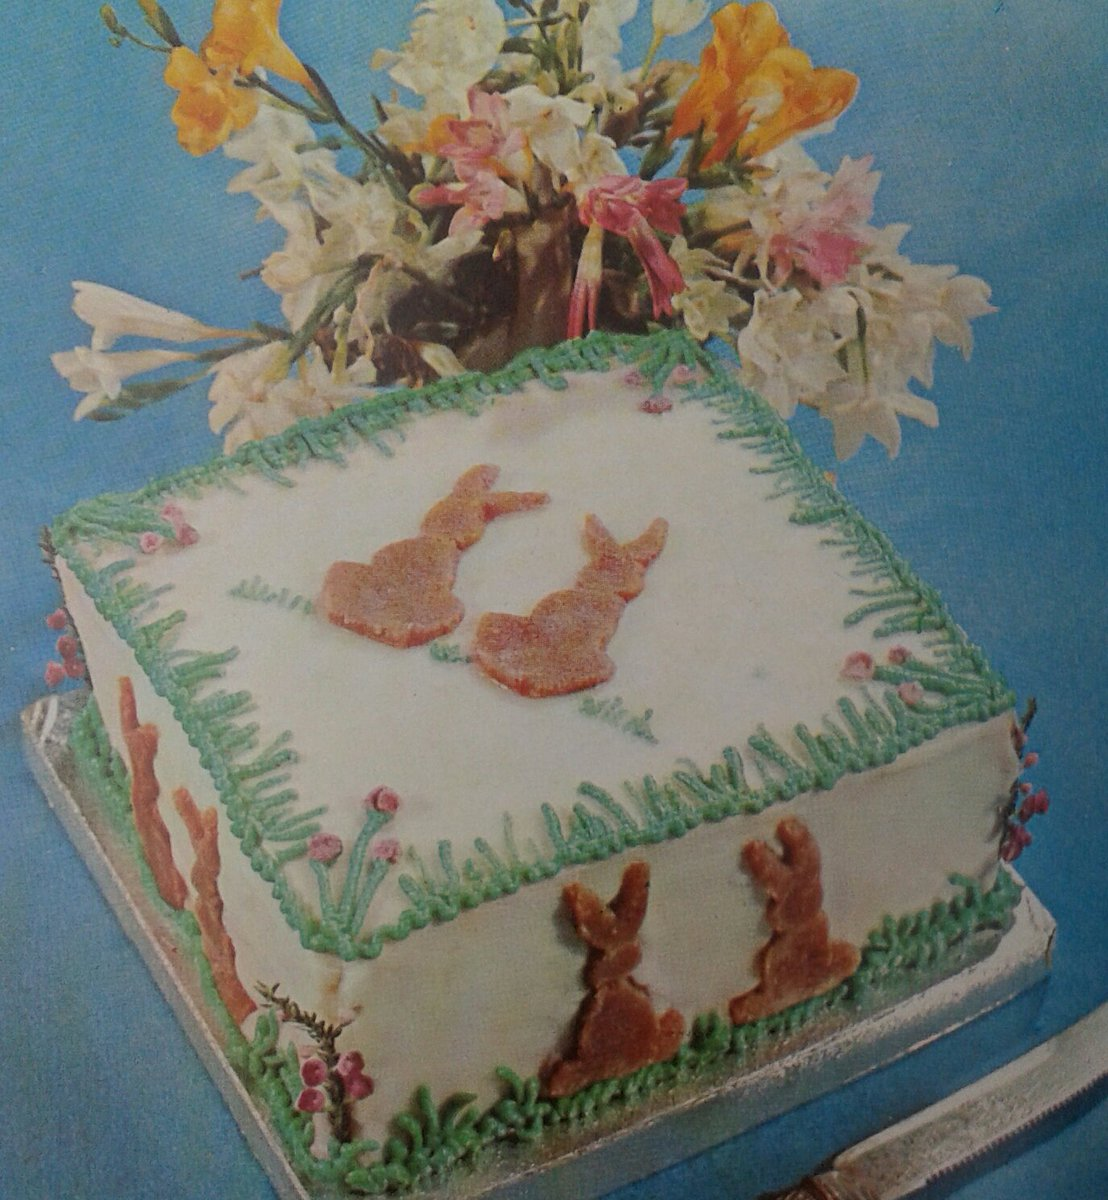 Sindy Loves Vintage On Twitter 70s Easter Birthday Cake For